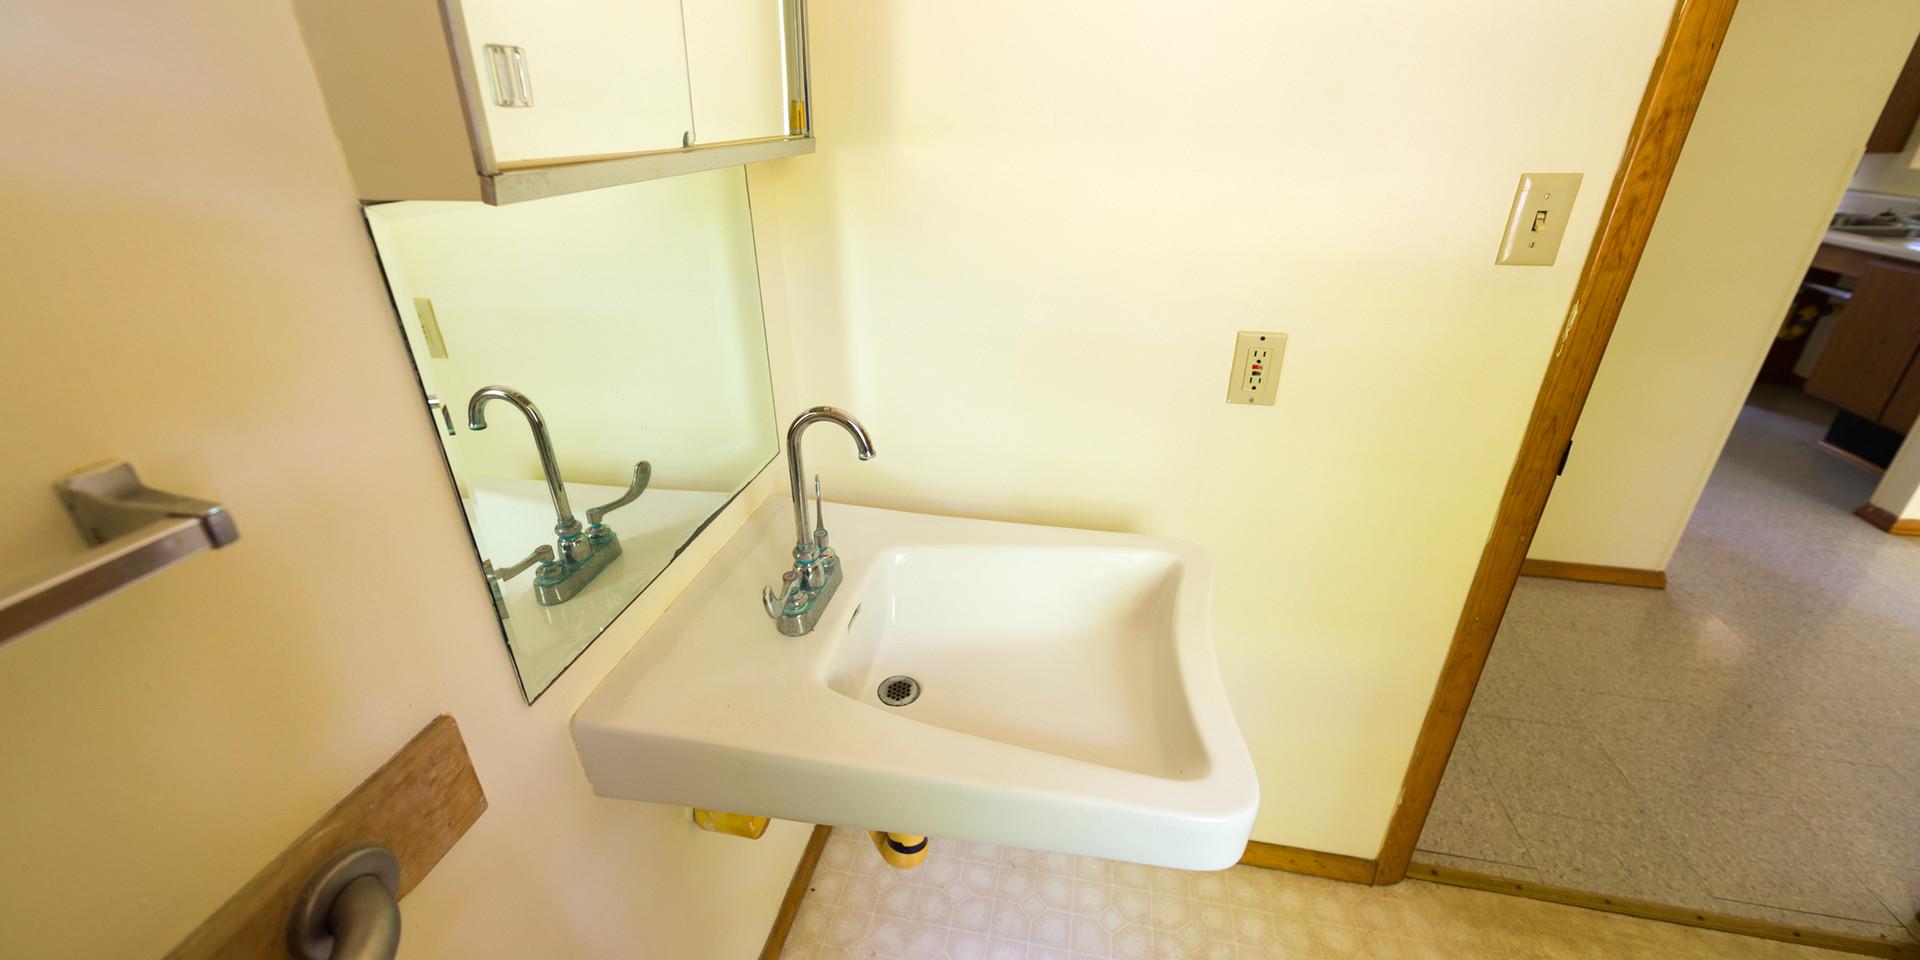 Cabin-Bathroom-Sink.jpg